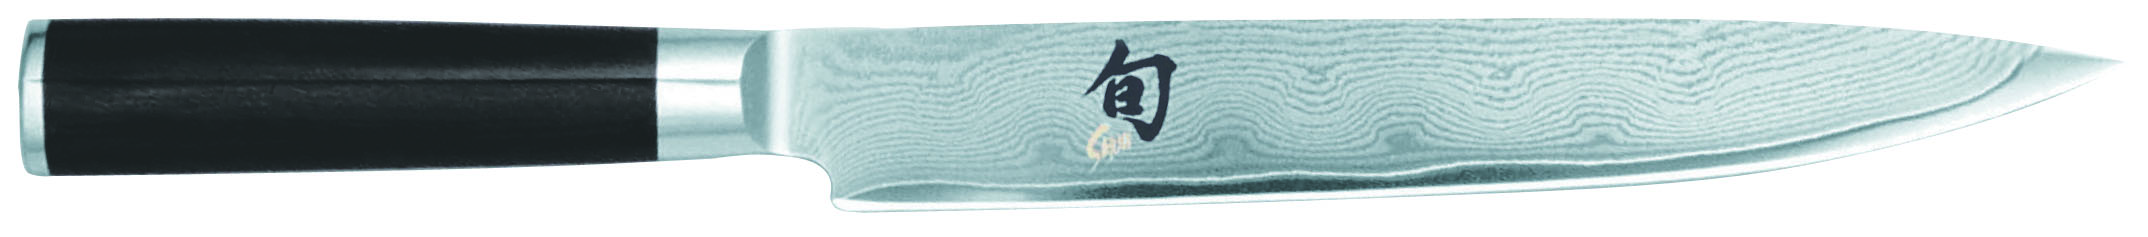 Kai Shun Classic DM-0704 Förskärare 23 cm